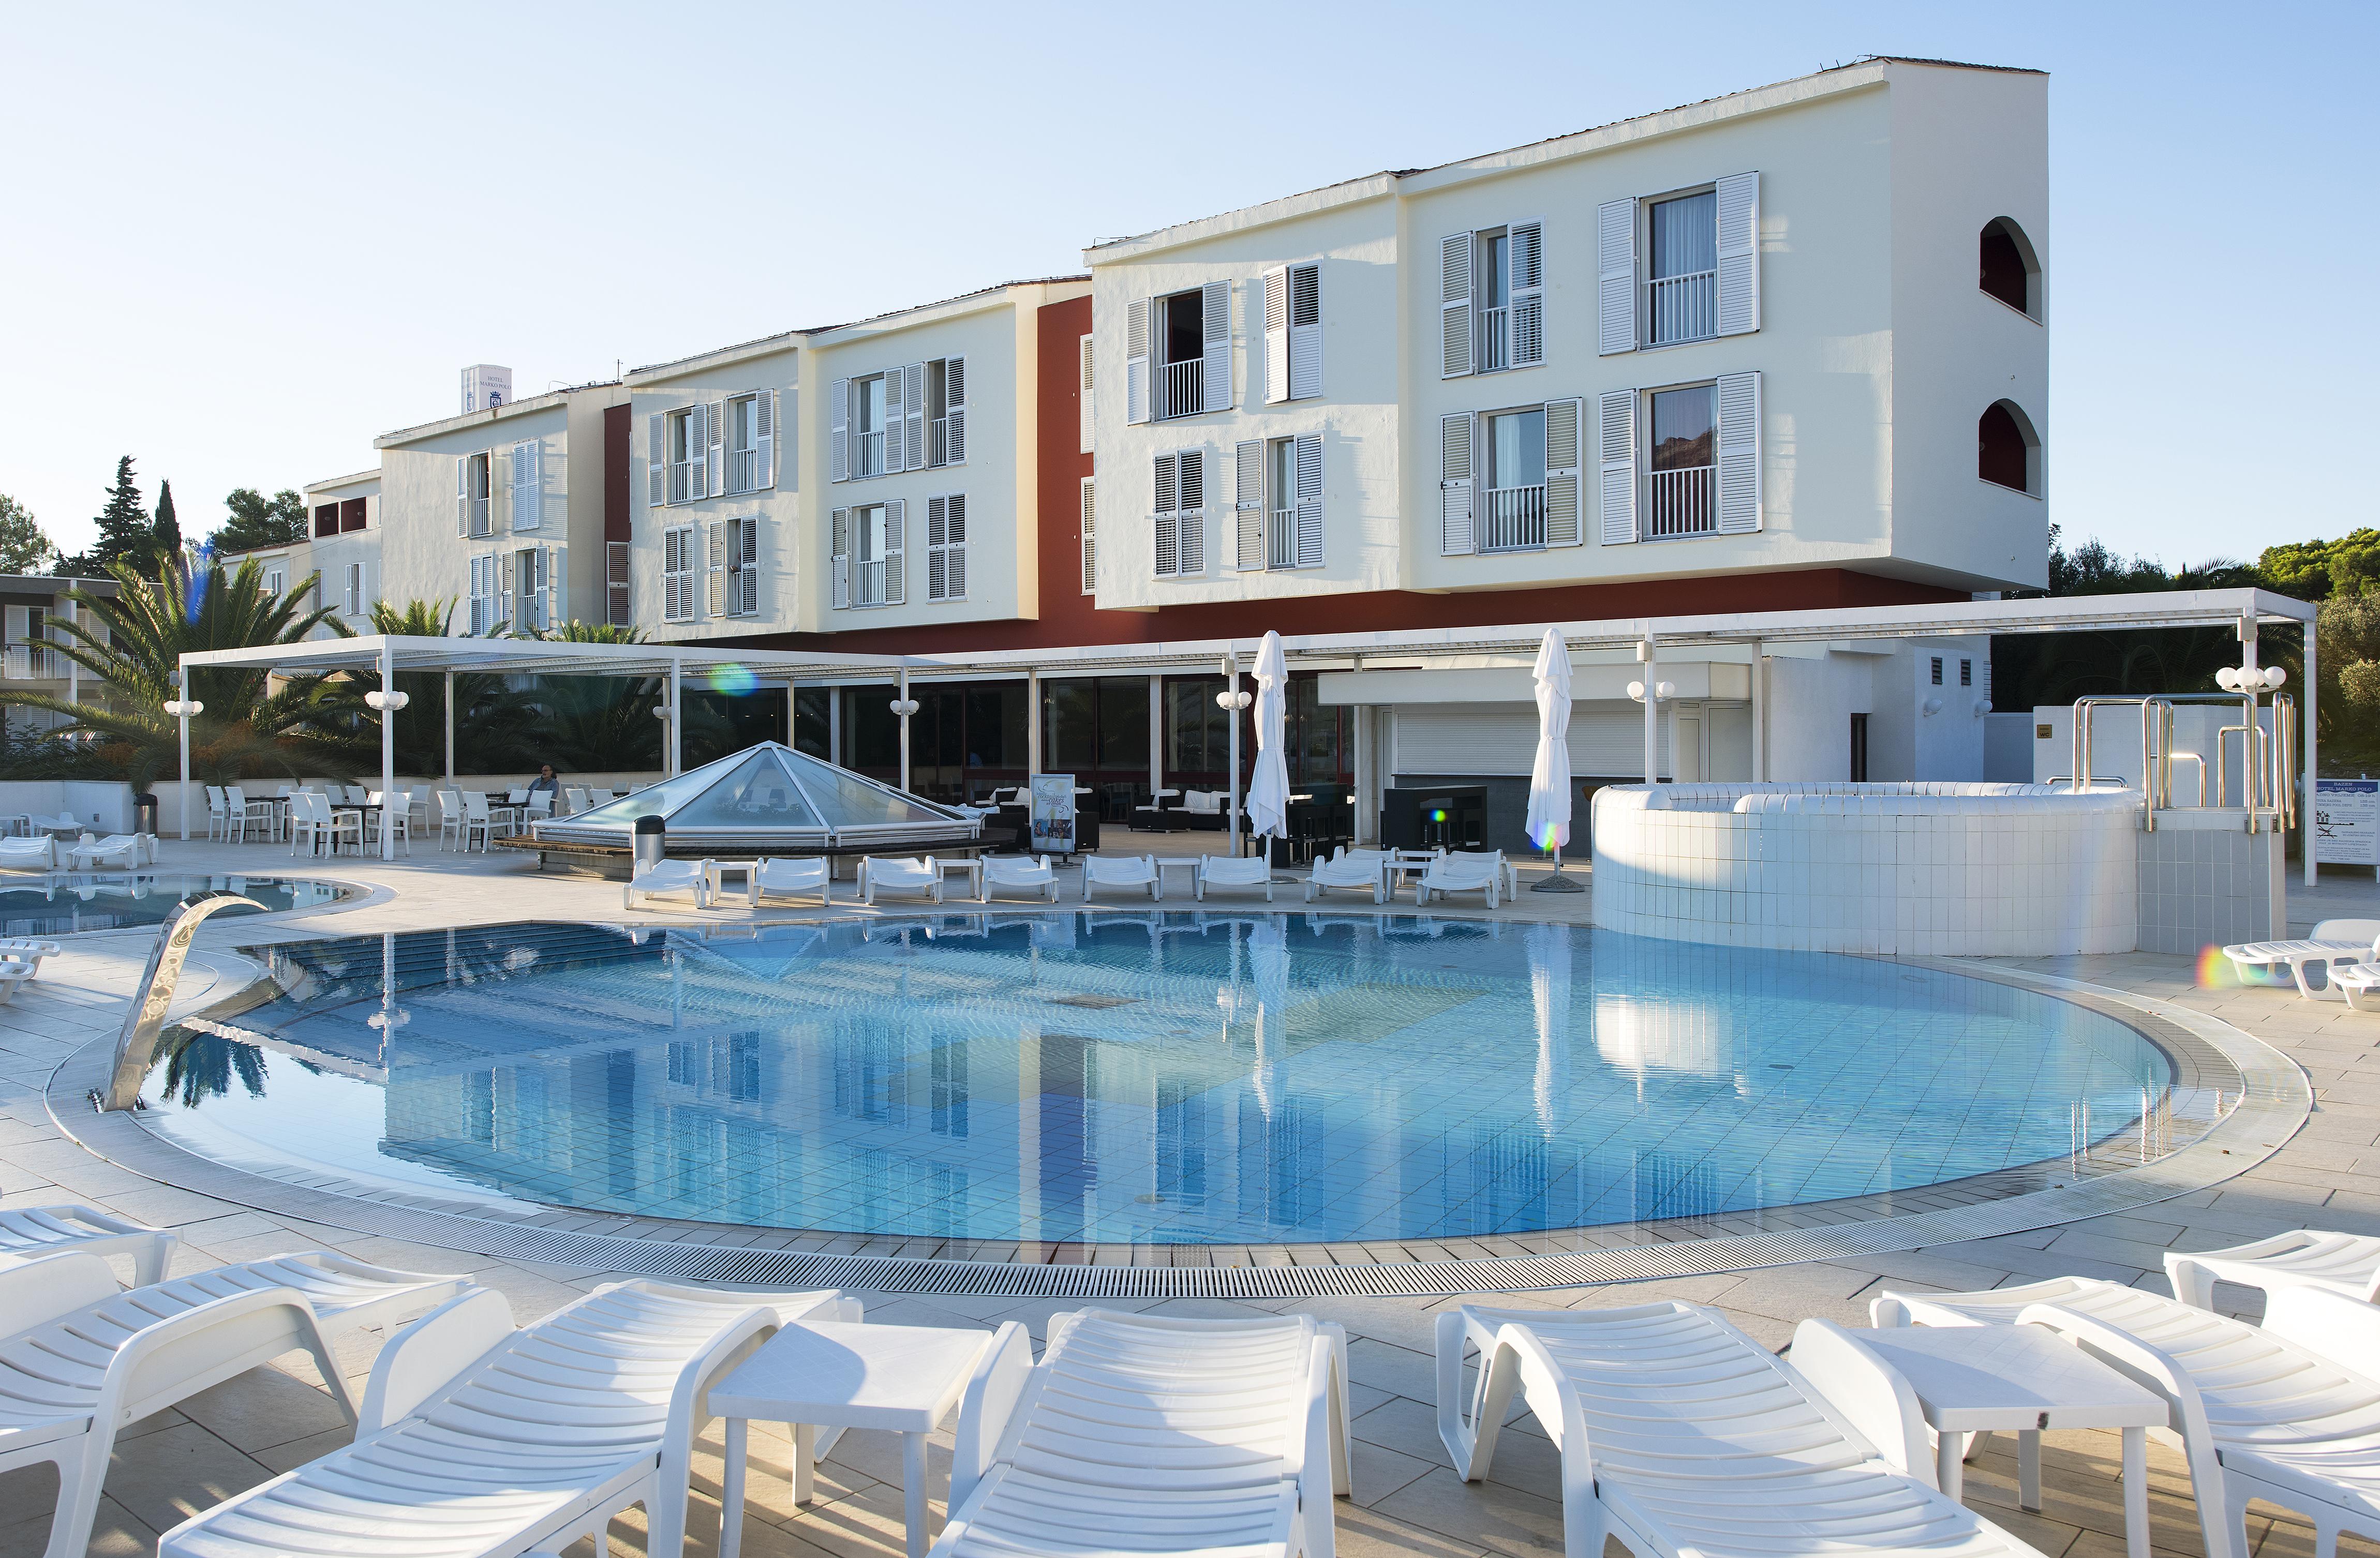 Hotel_Marko_Polo_Korčula_2